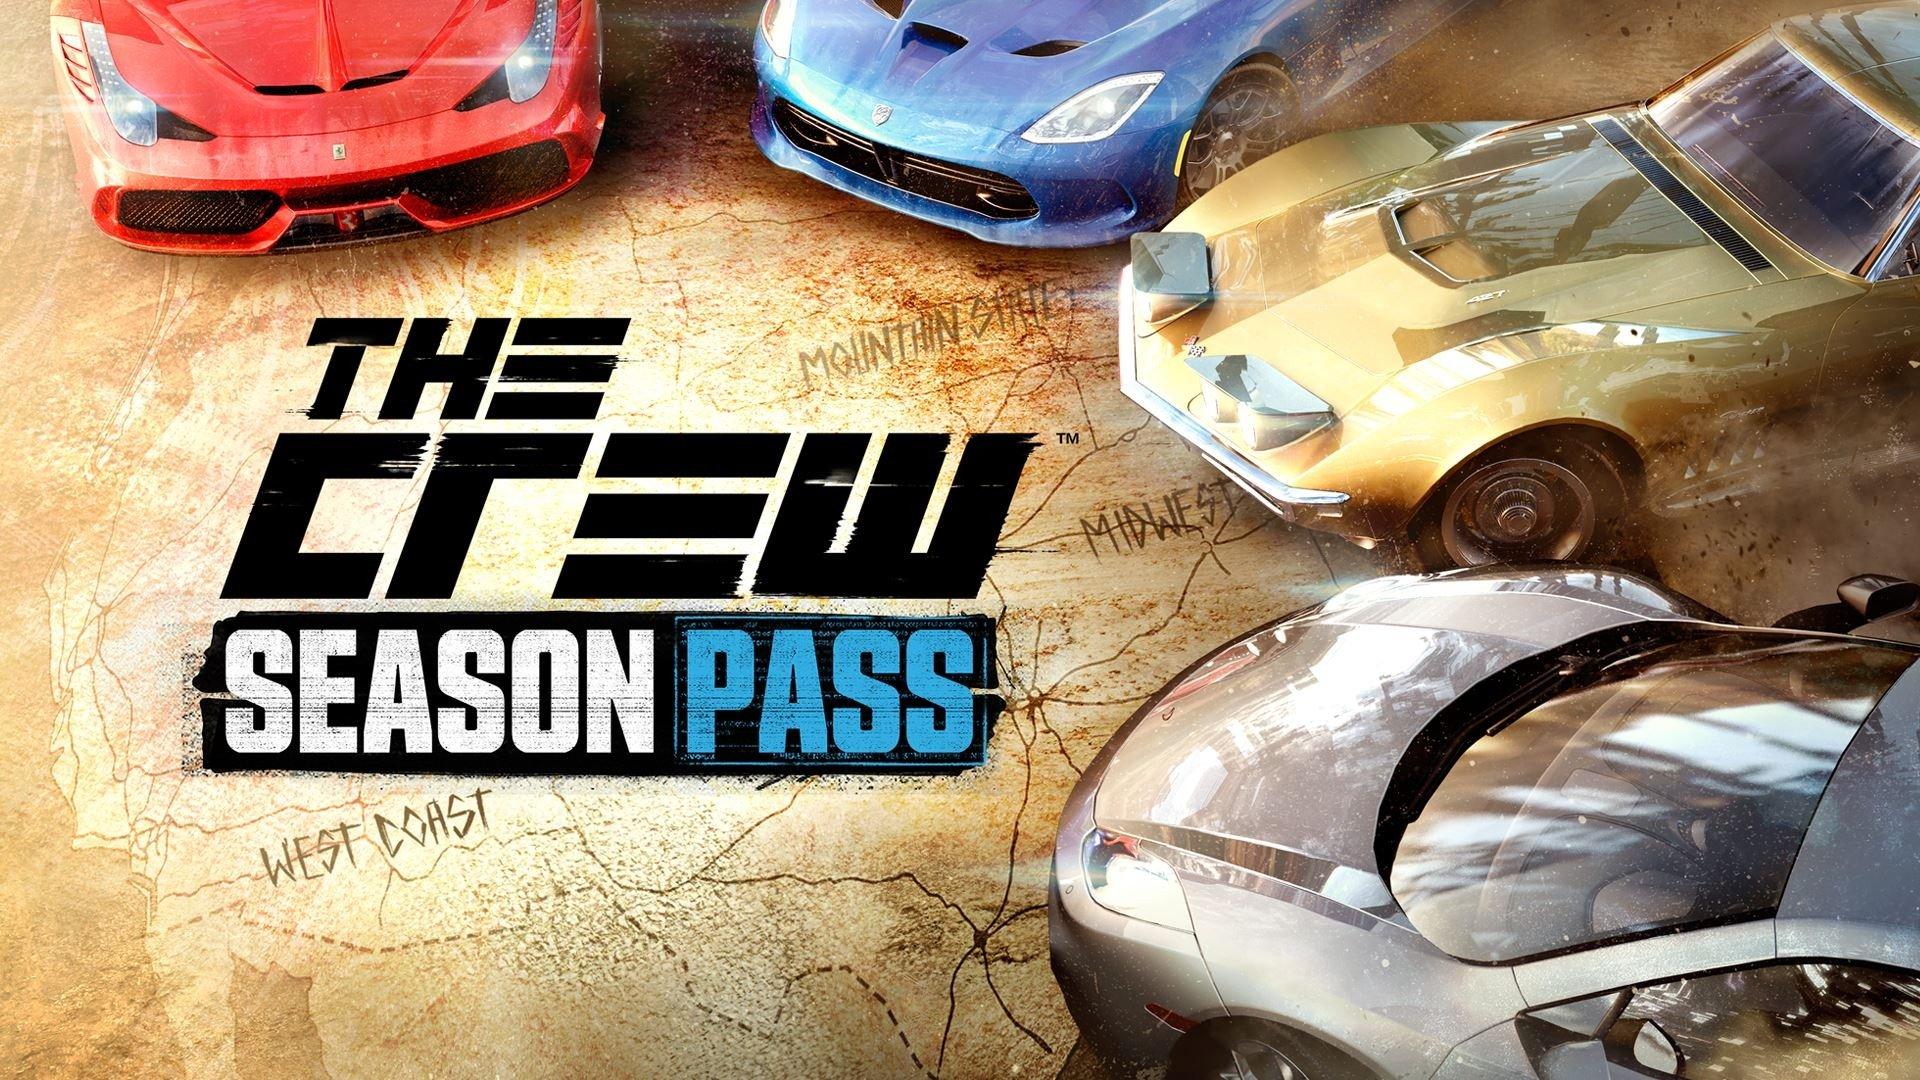 The Crew, Dodge Viper, Video games, Ferrari 458 Speciale, Ferrari, Chevrolet, McLaren, McLaren MP4 12C, Ubisoft Wallpaper